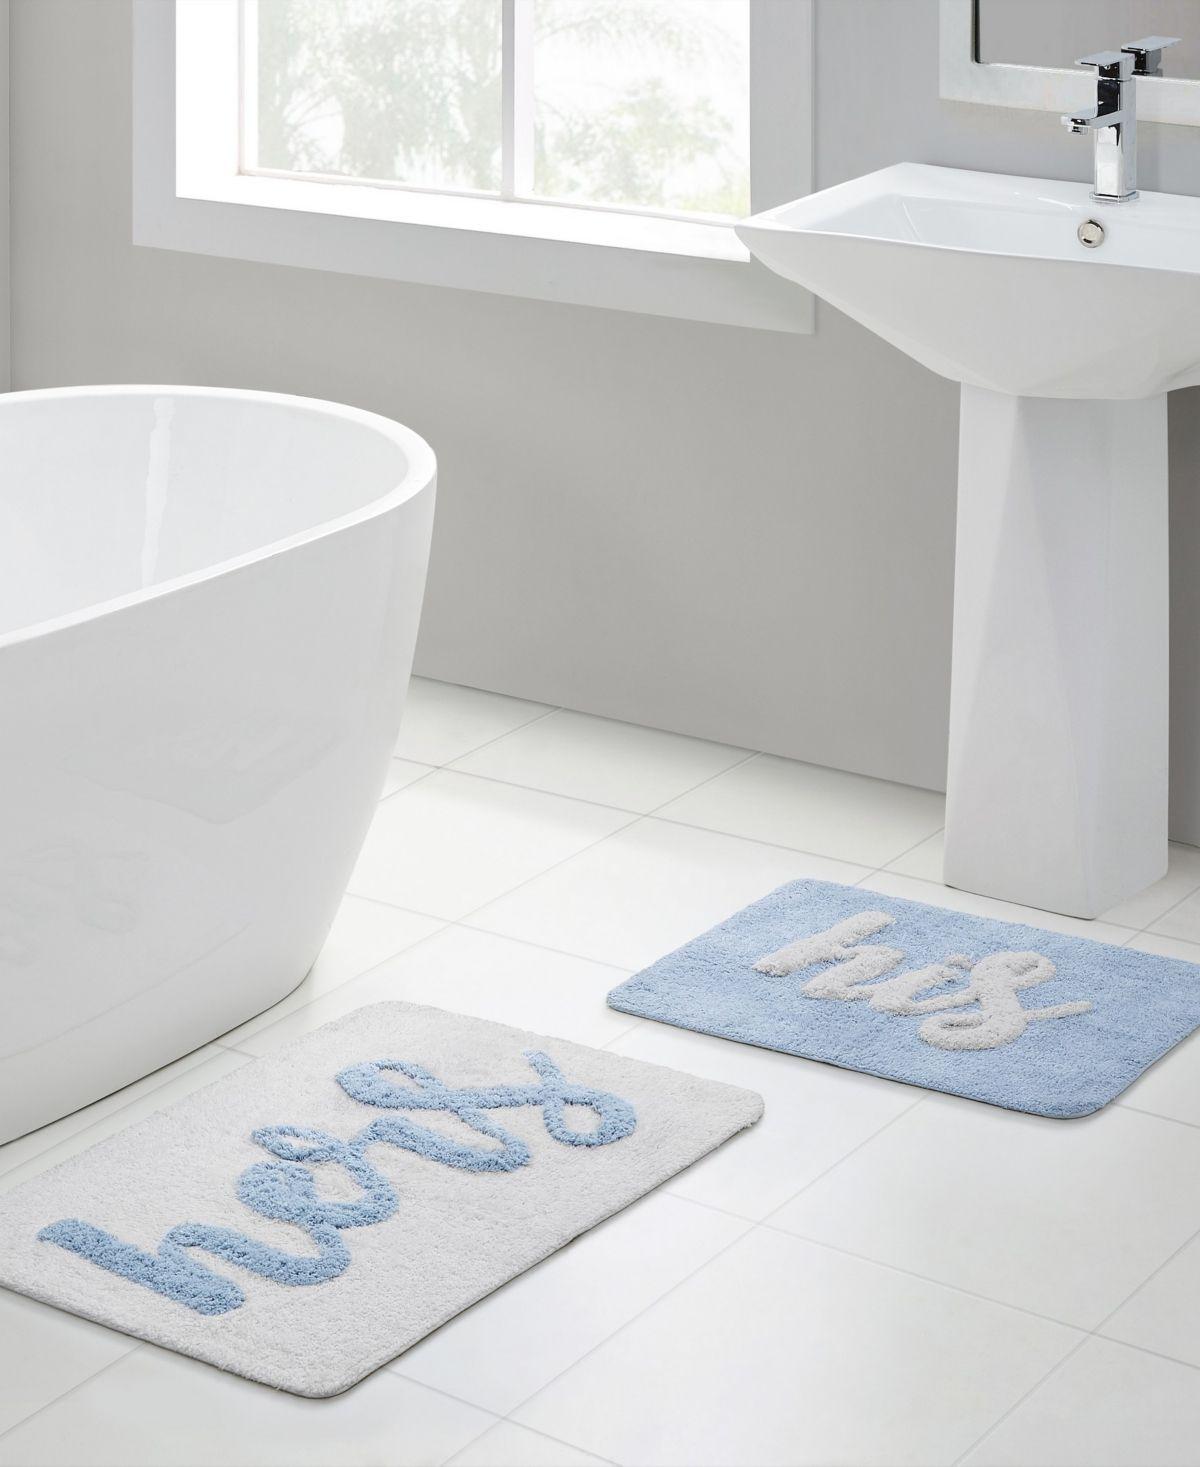 Macys His And Hers Bath Mats